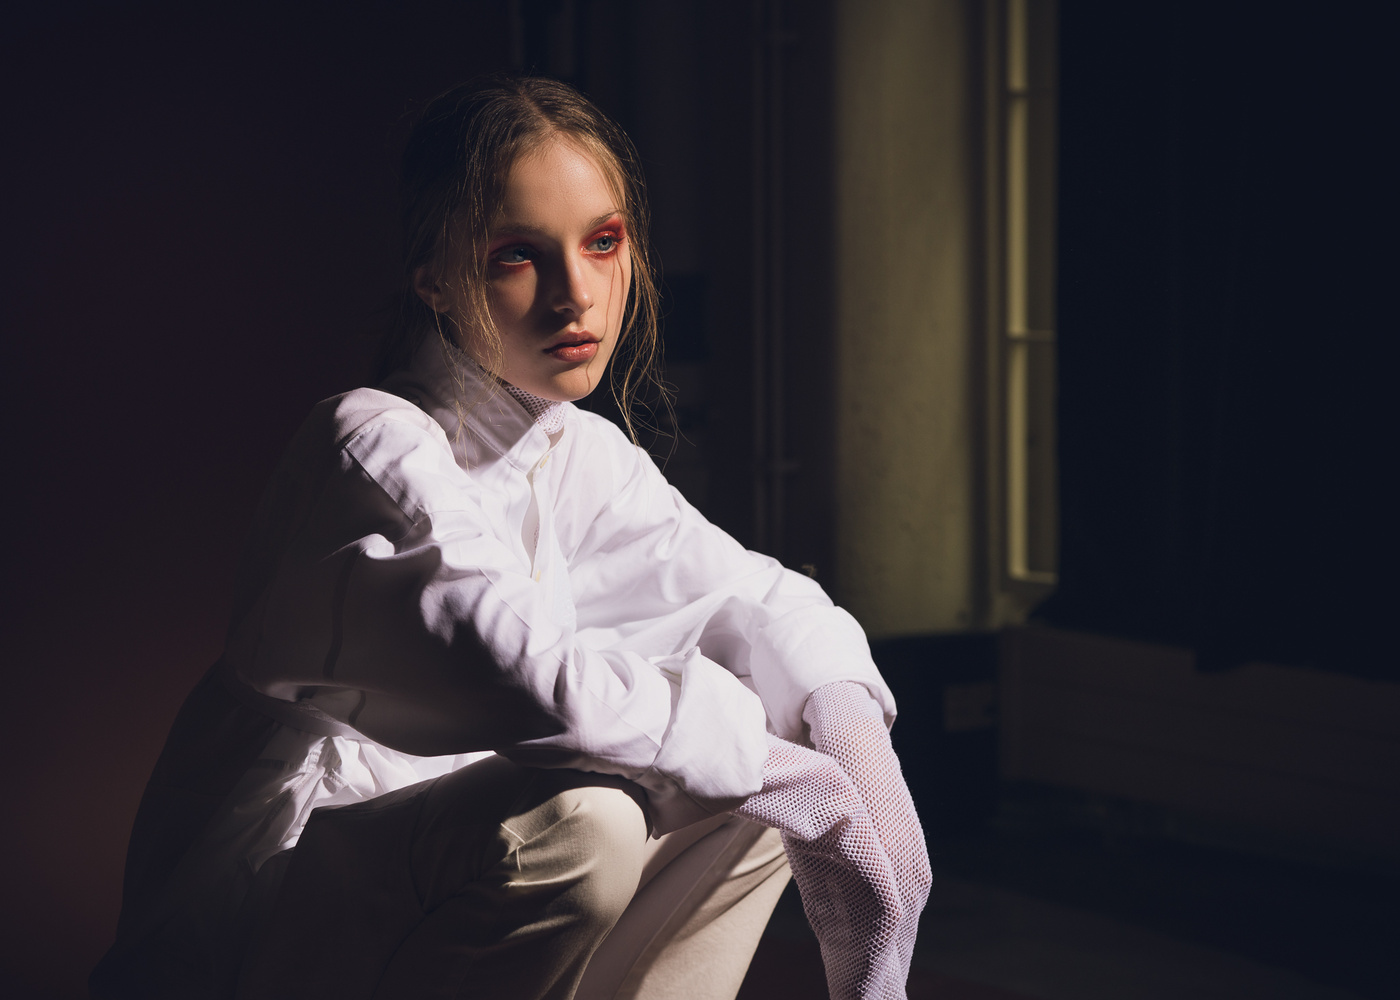 Not so dark by Fredrik Tillroth